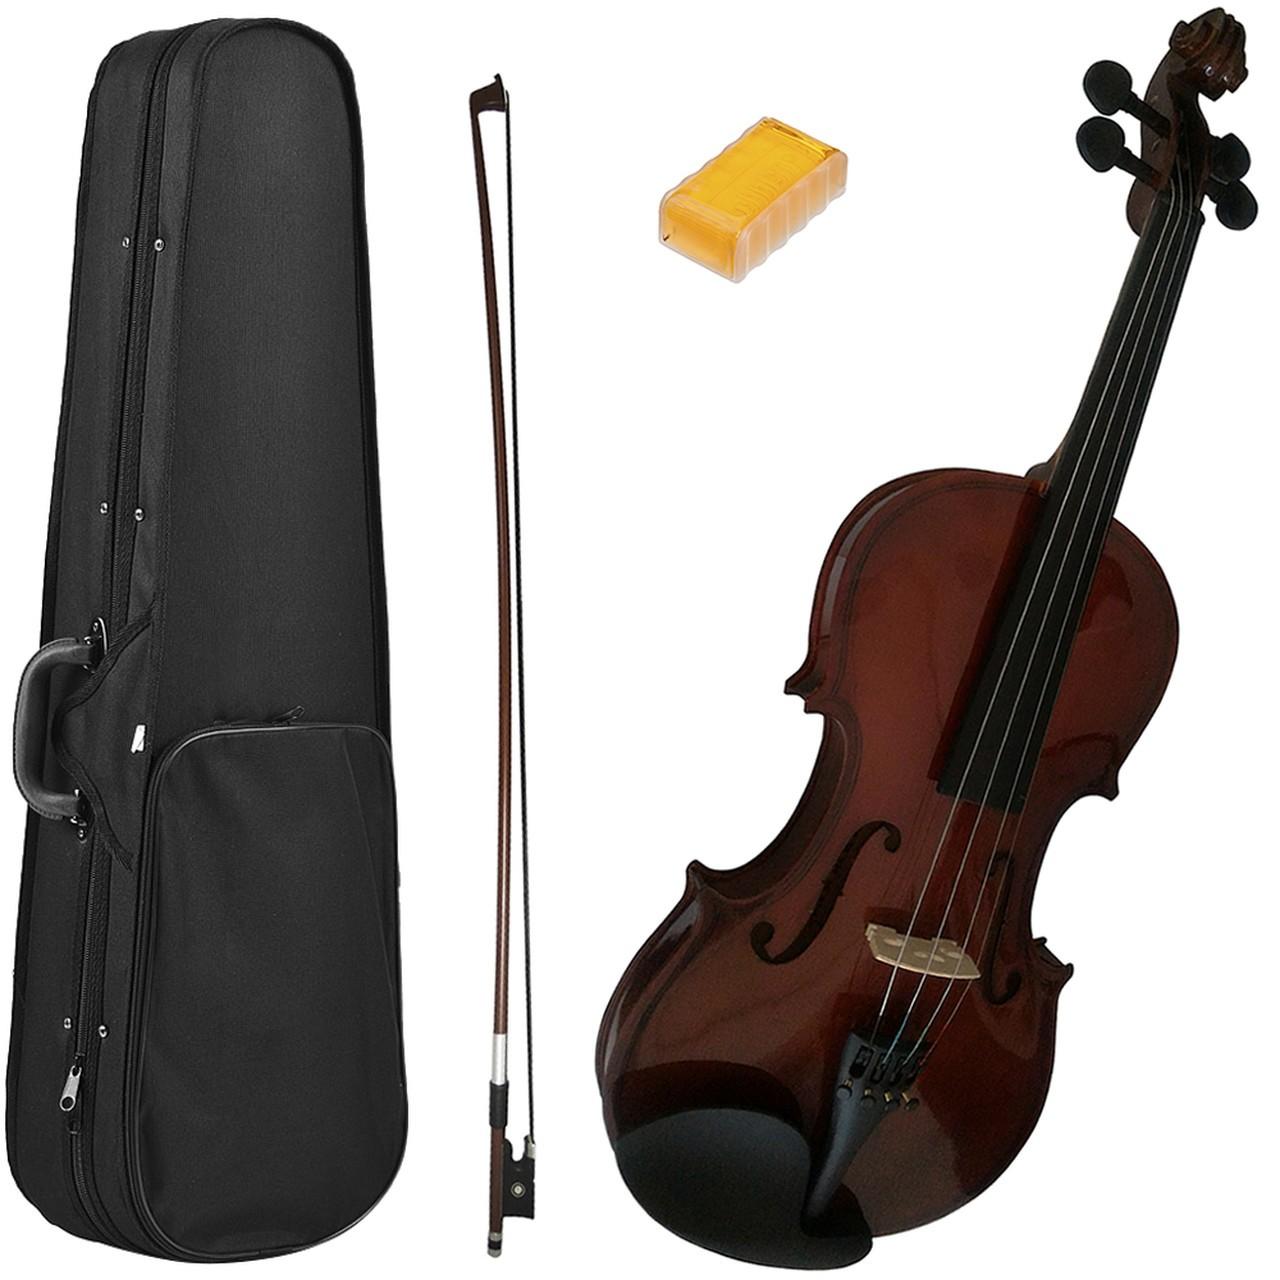 Violino MARINOS CLASSIC Series 4/4 MV-44 Germany